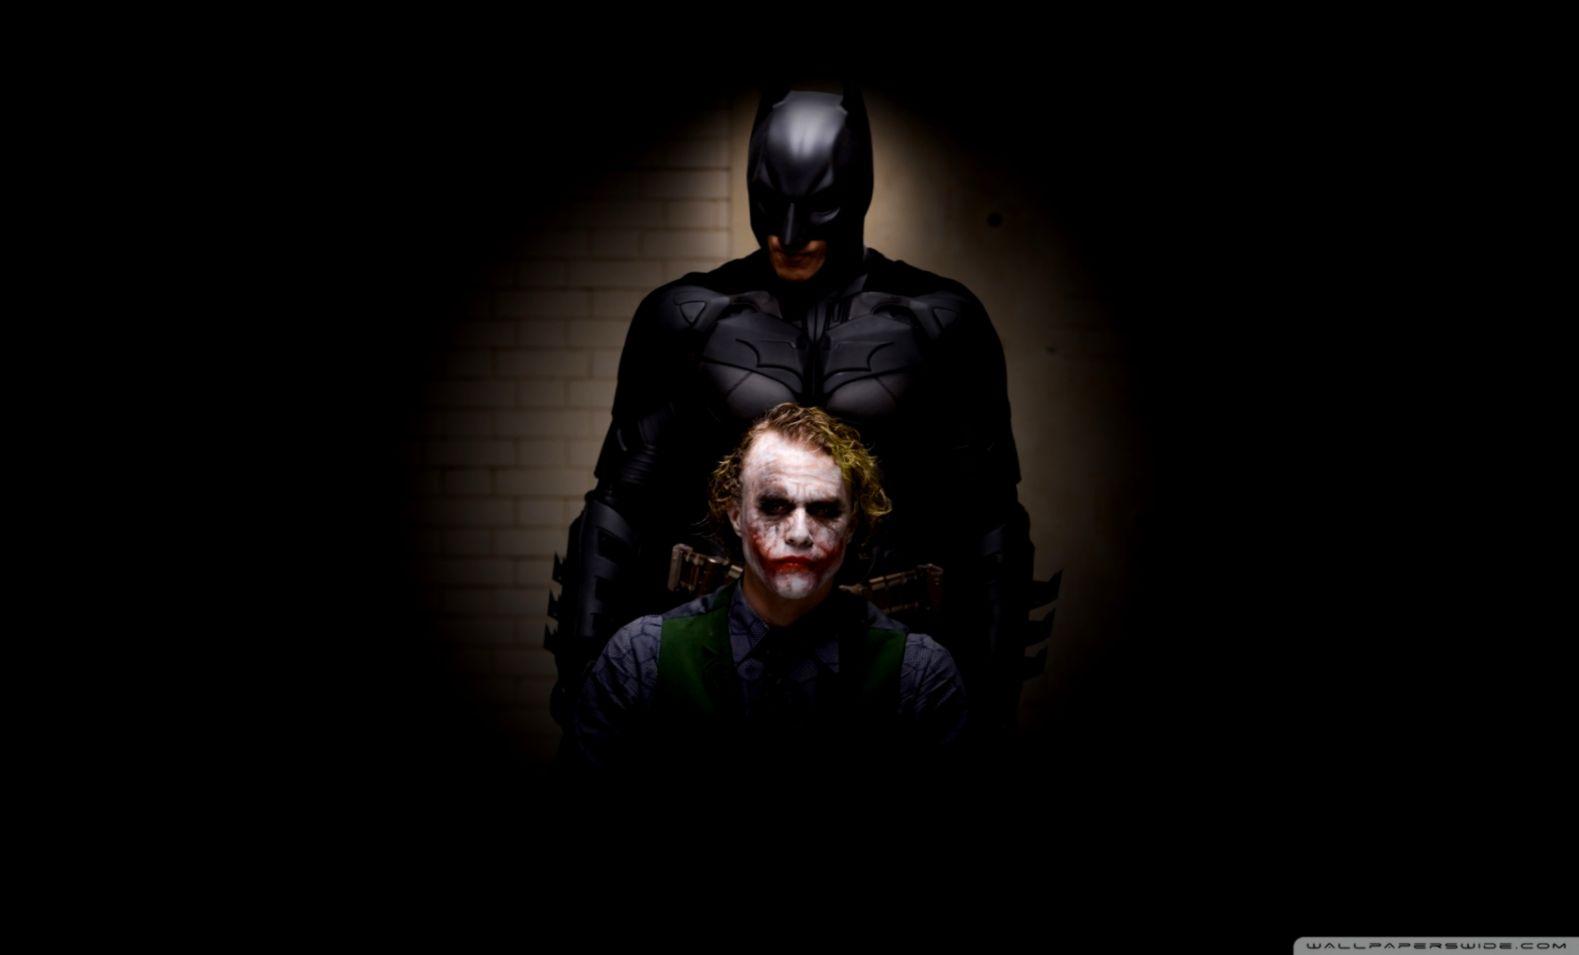 Joker Batman Wallpapers Missmermmaid